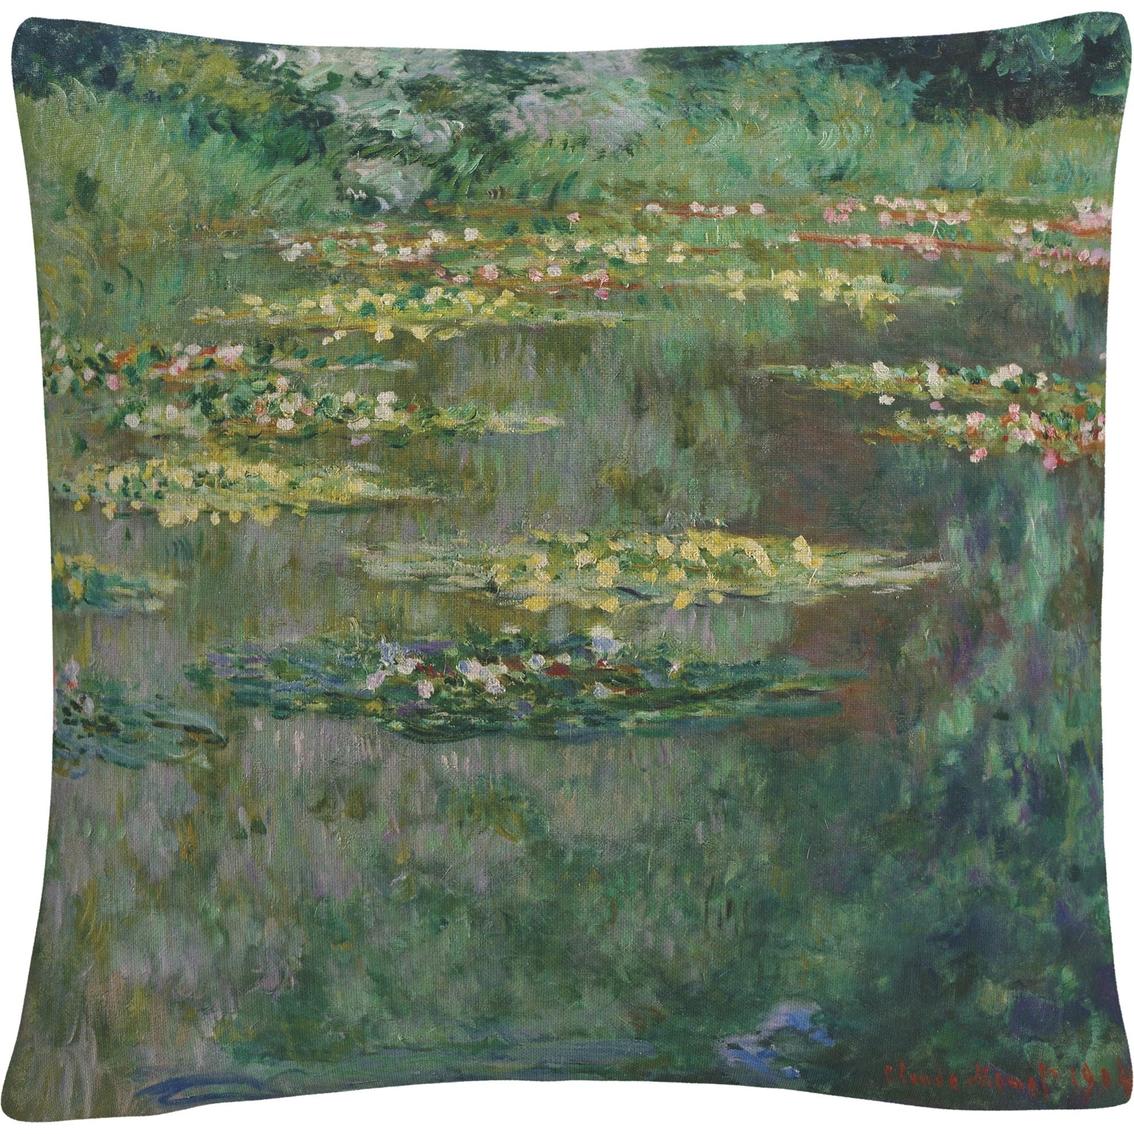 Trademark Fine Art Claude Monet Le Bin Des Nympheas Decorative Throw Pillow